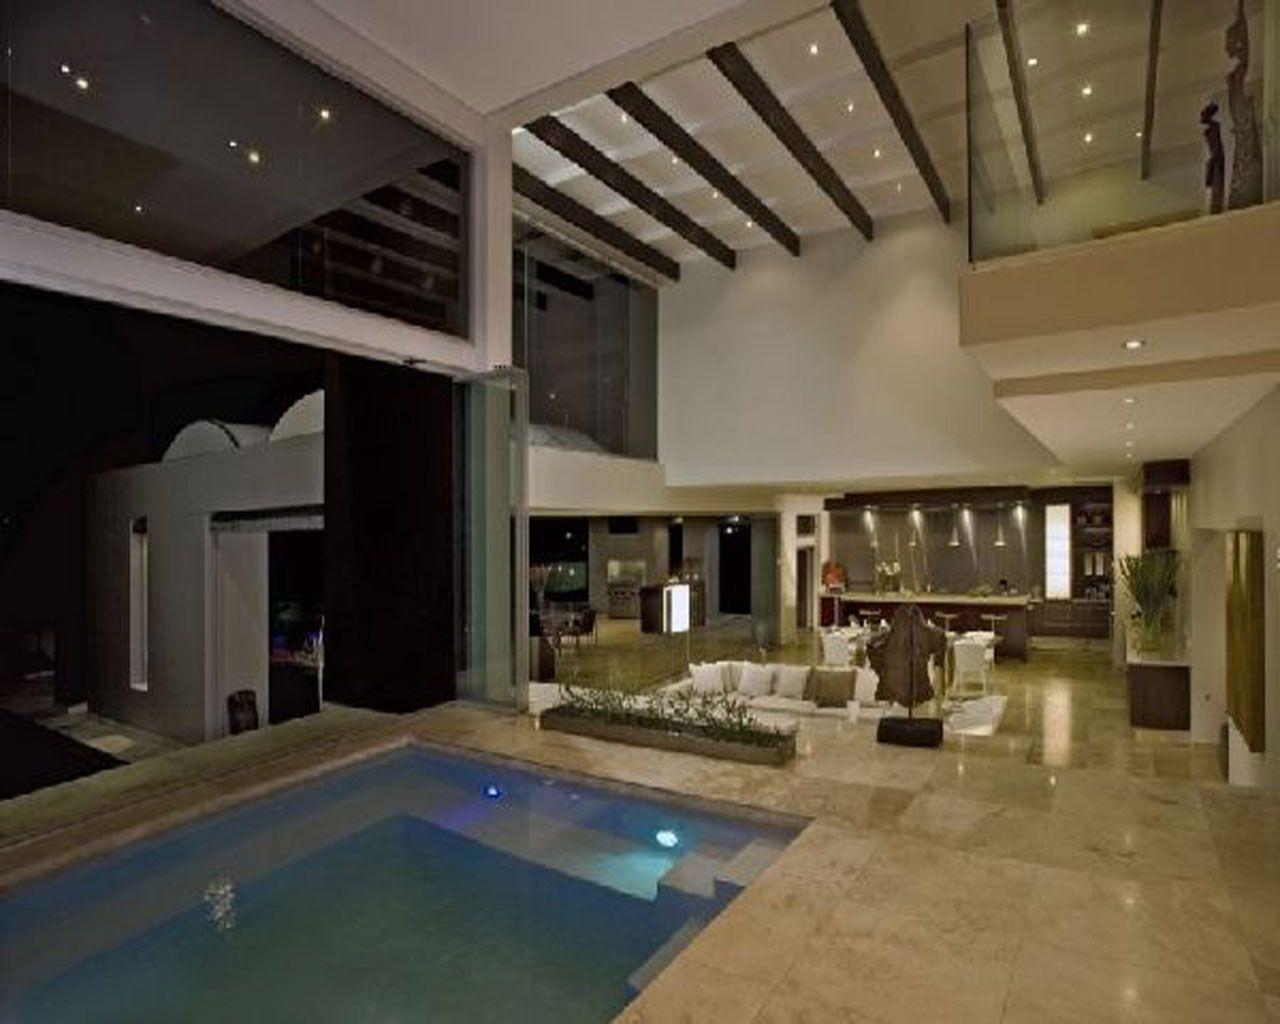 Modern home indoor pool  unique indoor home pools   Wonderful indoor pool modern design ...